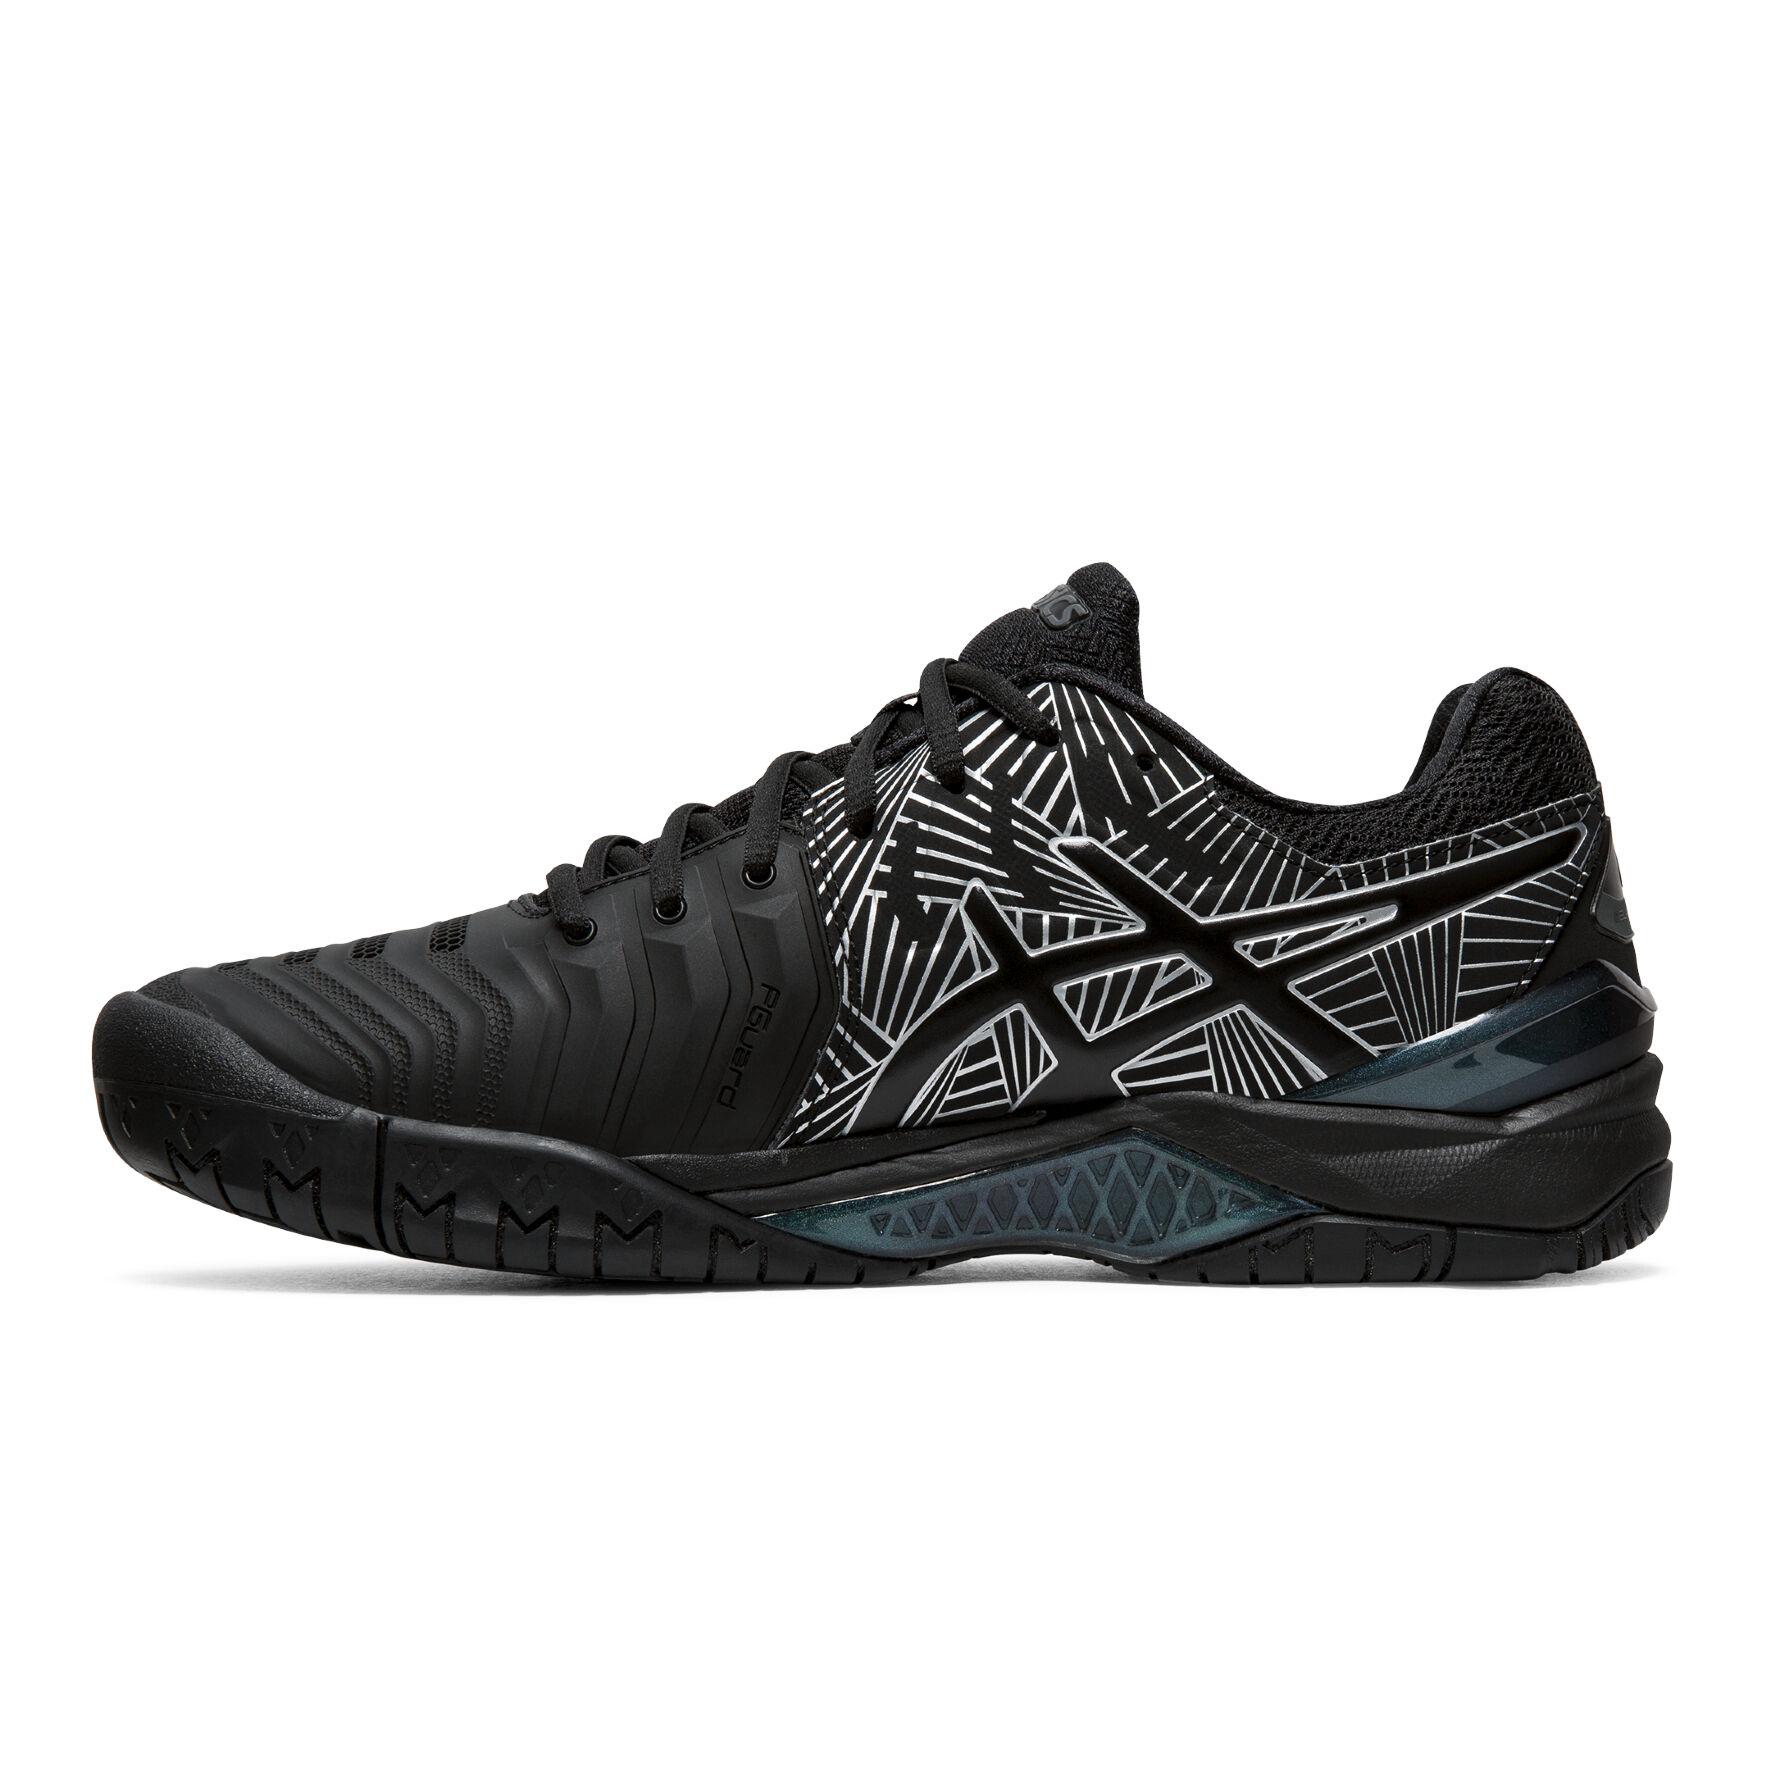 Asics Gel-Resolution 7 Chaussures Toutes Surfaces Hommes - Noir ...